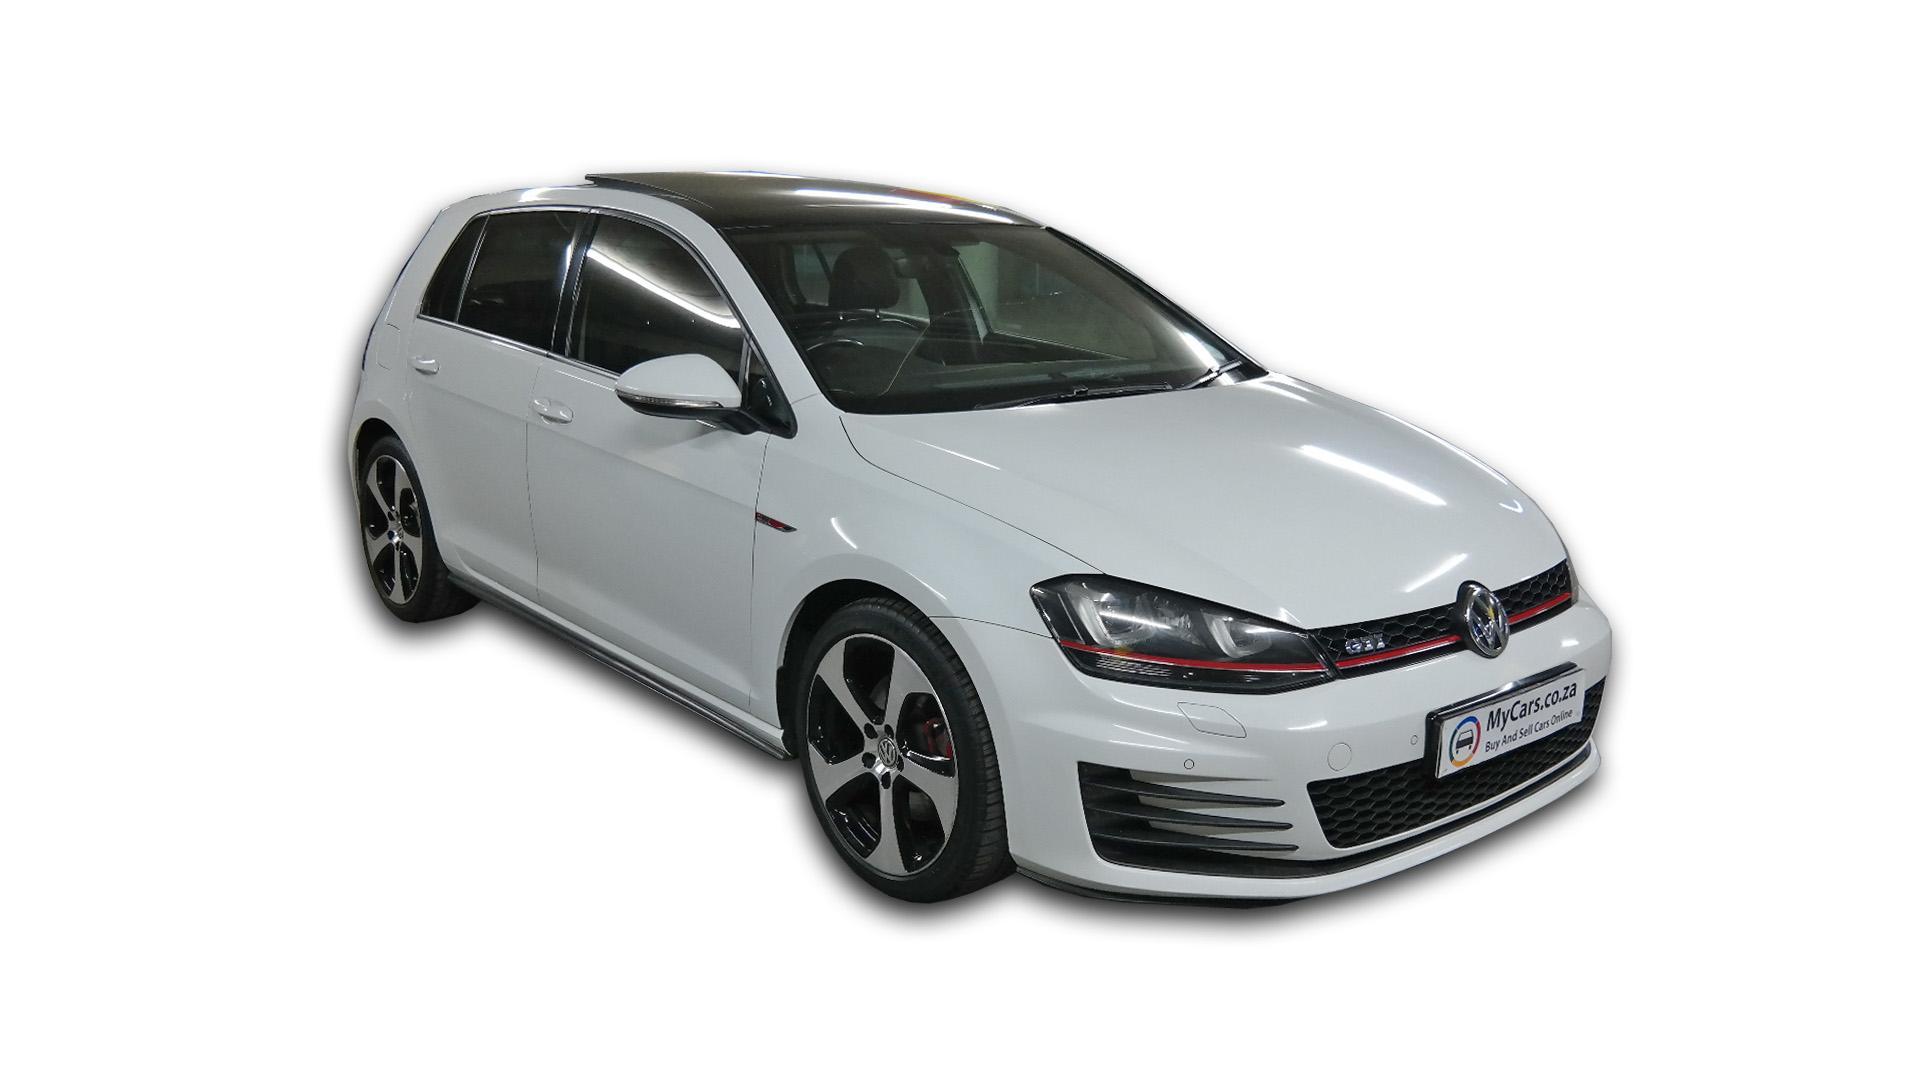 Volkswagen Golf 7 2.0 Tsi